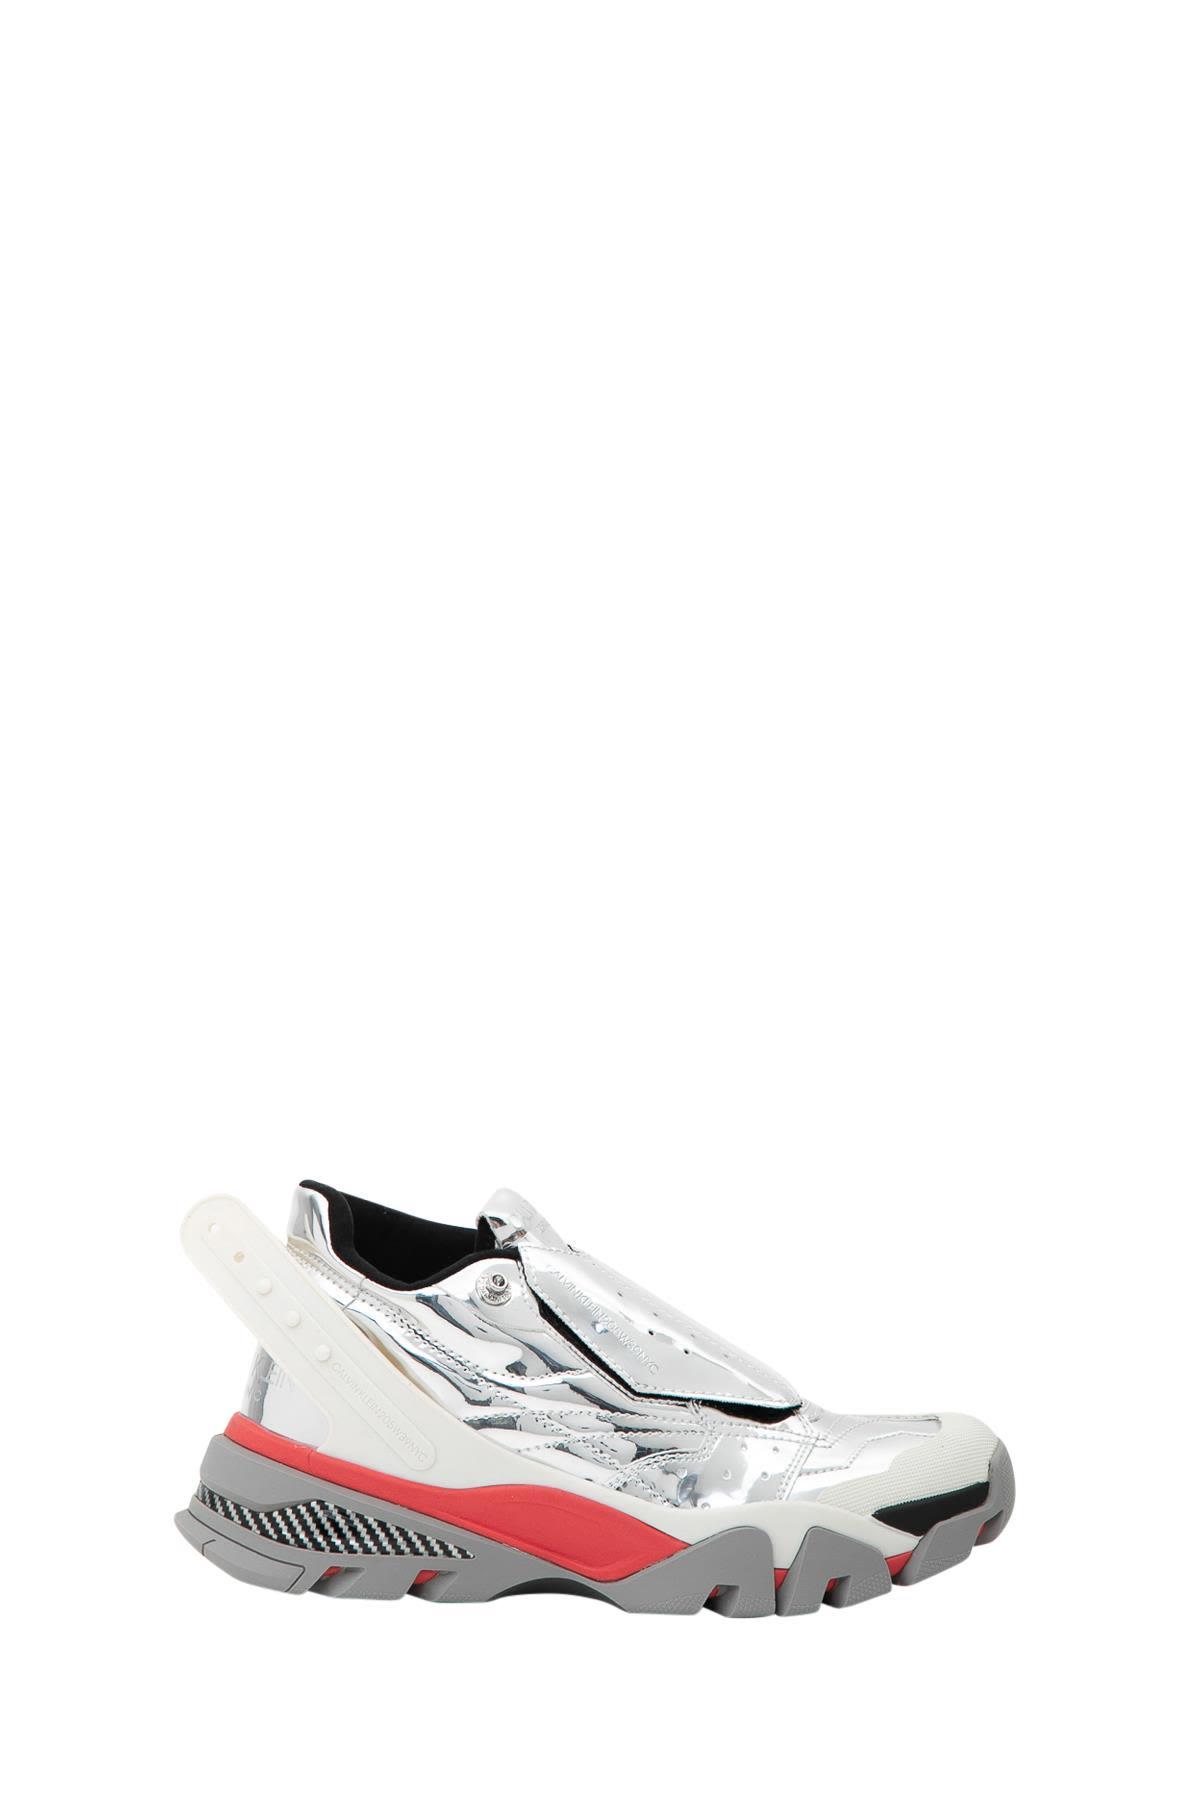 Calvin Klein Carlos 10 Metallic Sneakers